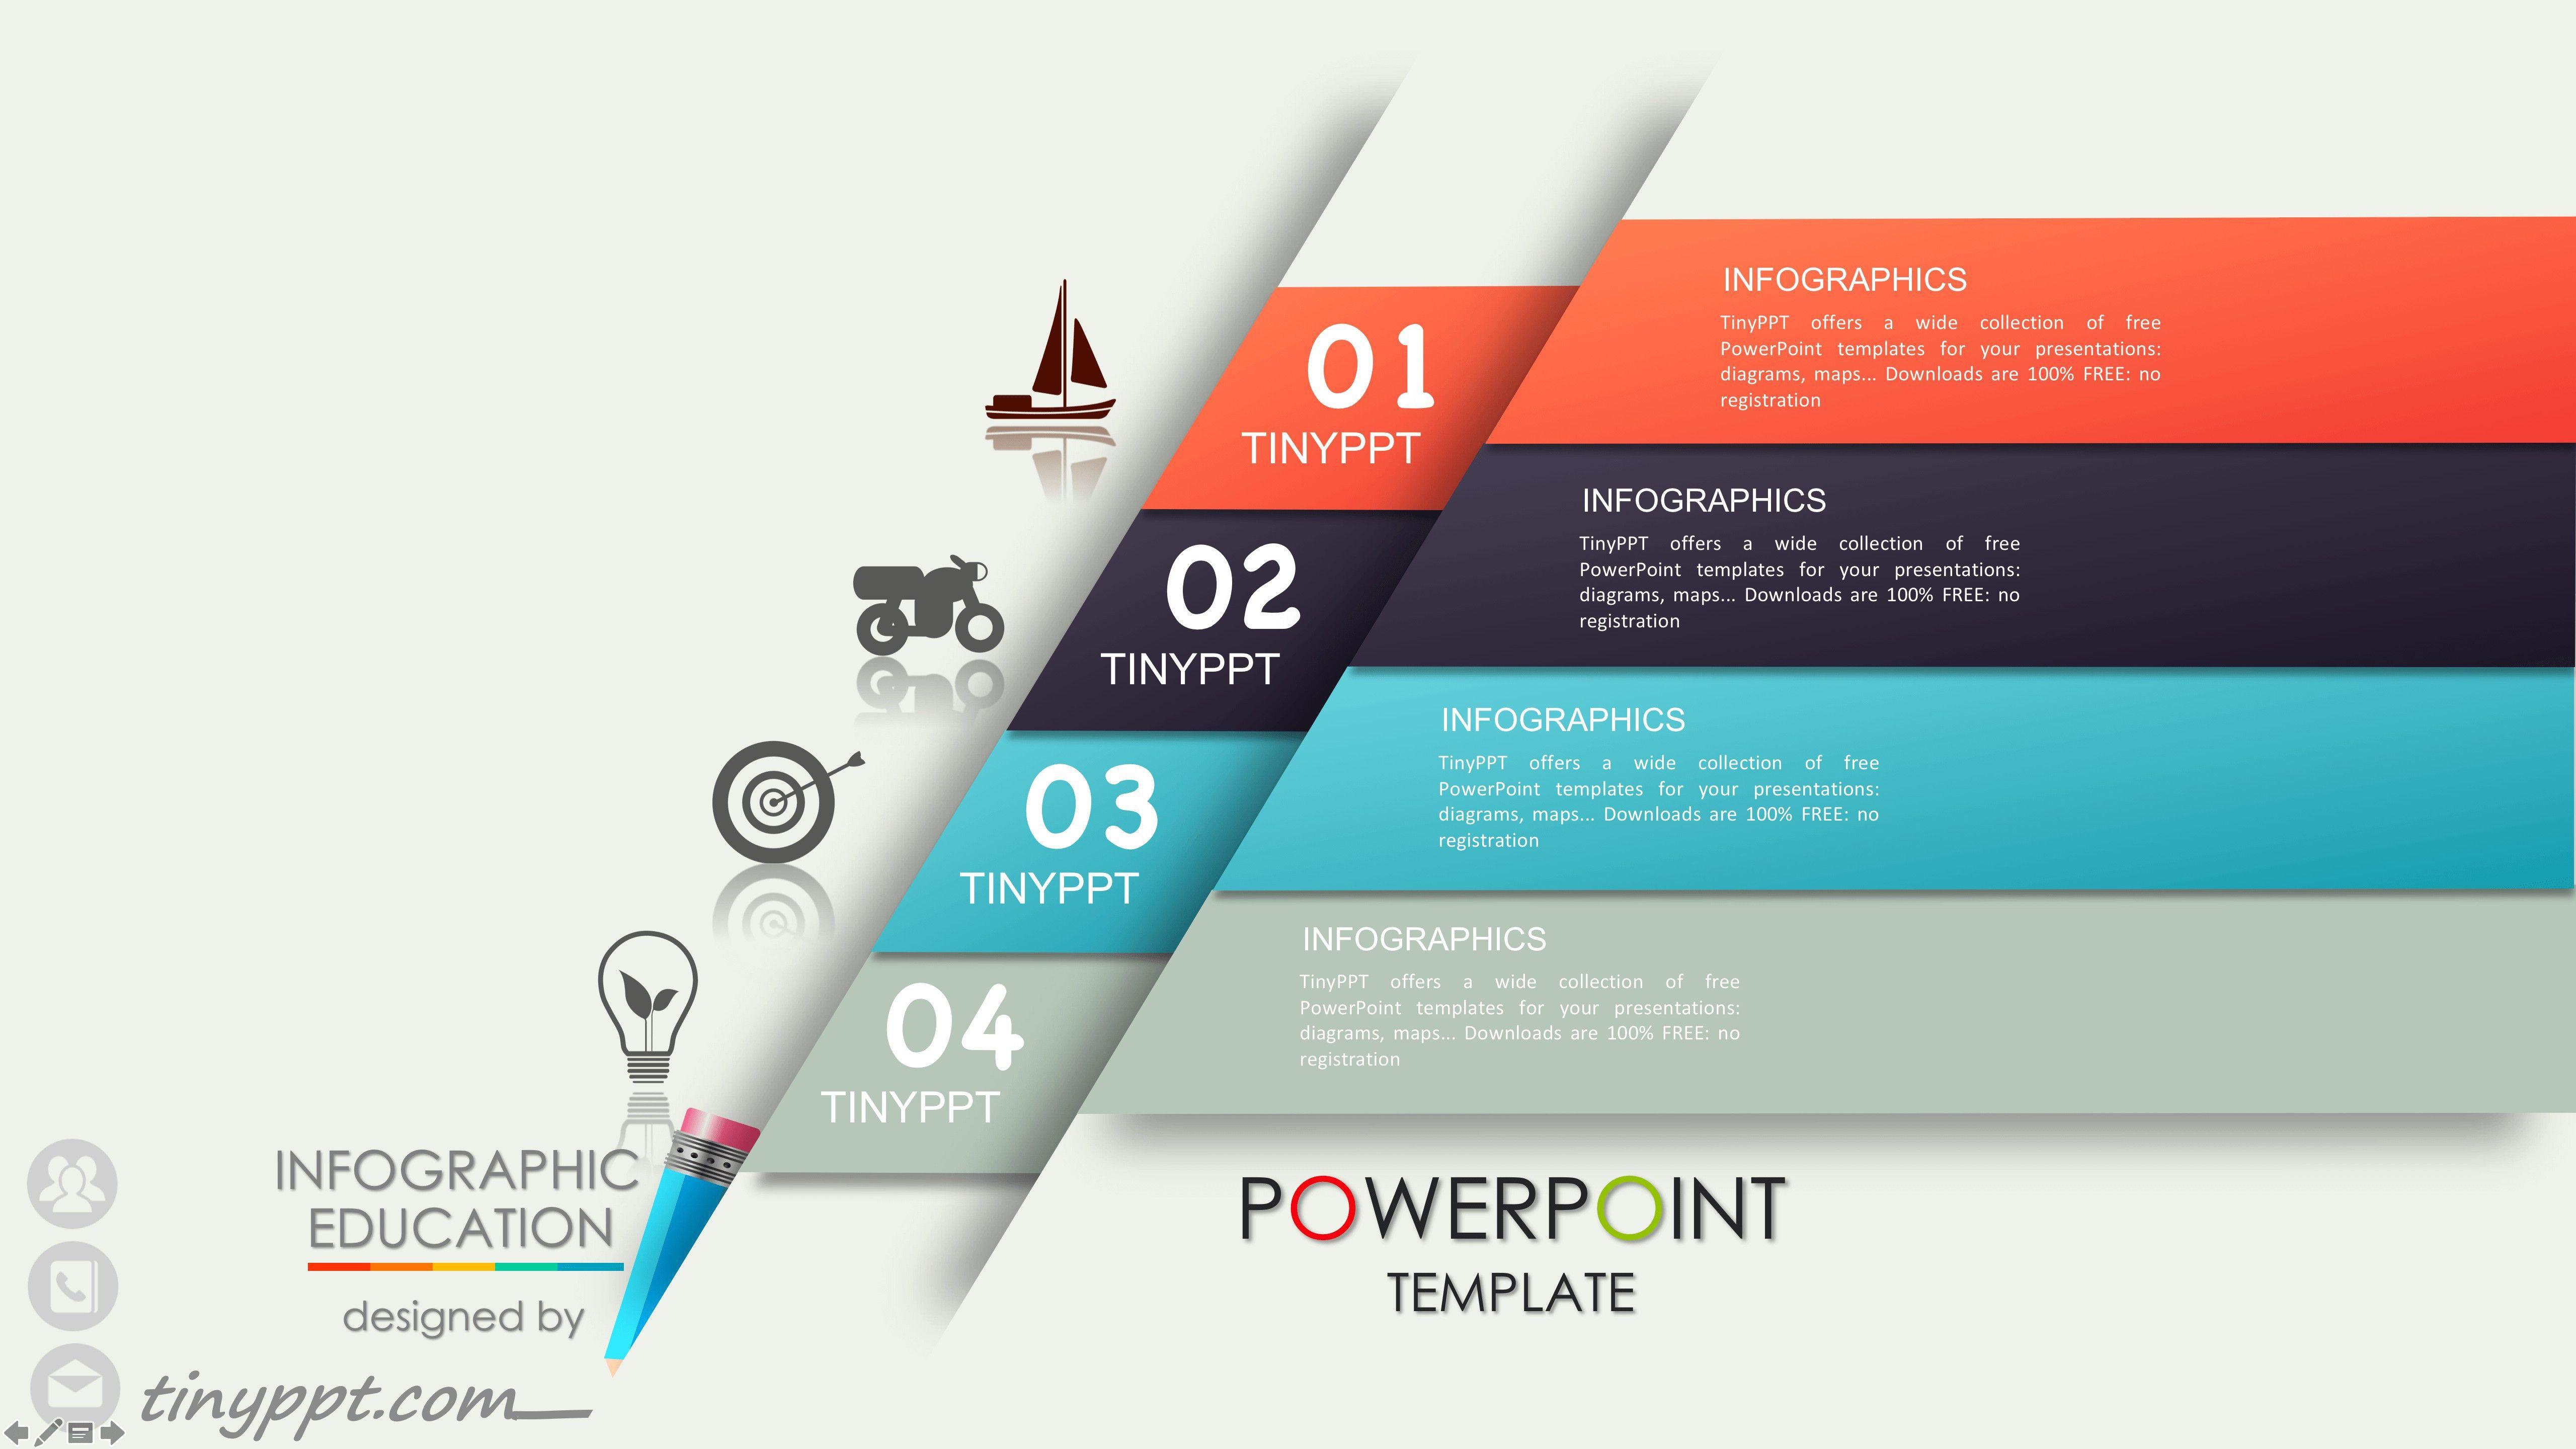 001 Remarkable Free Download Busines Proposal Template Ppt High Def  Best Plan Sample Plan.ppt 2020Full